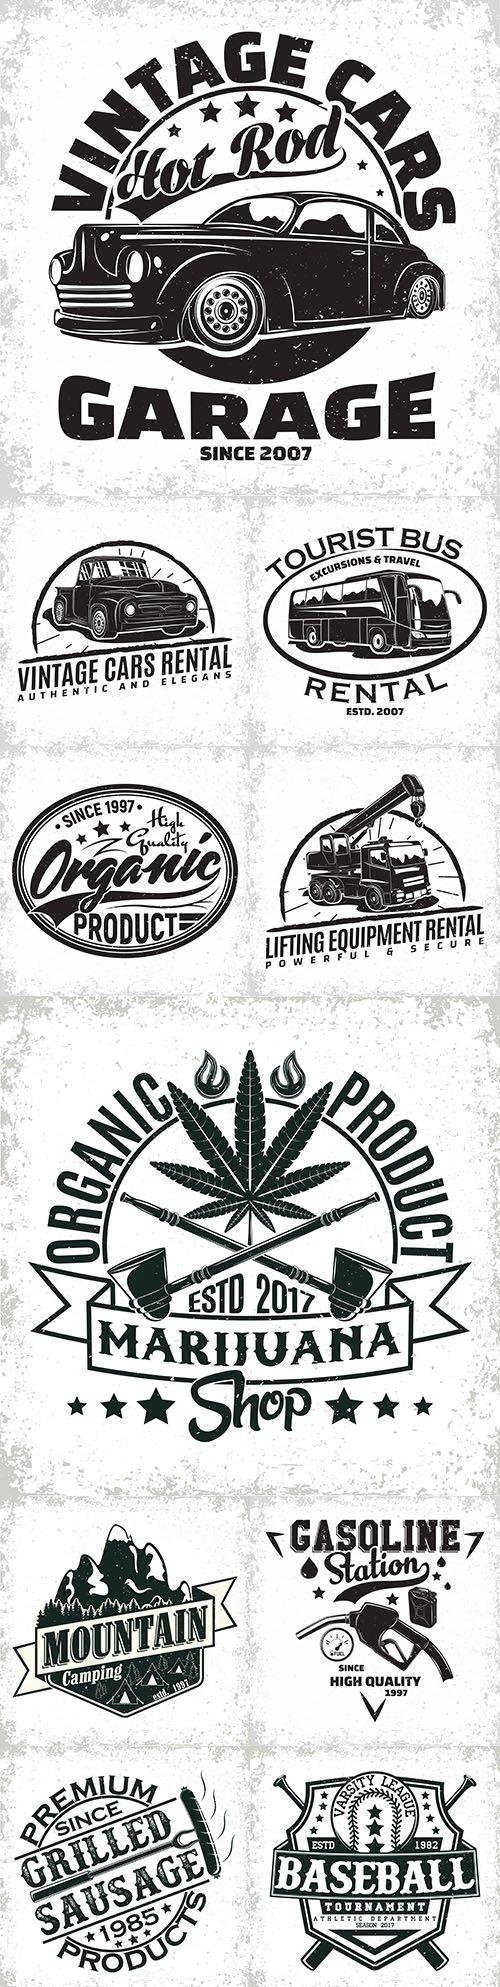 Vintage logo and grange printing emblem creative printing house